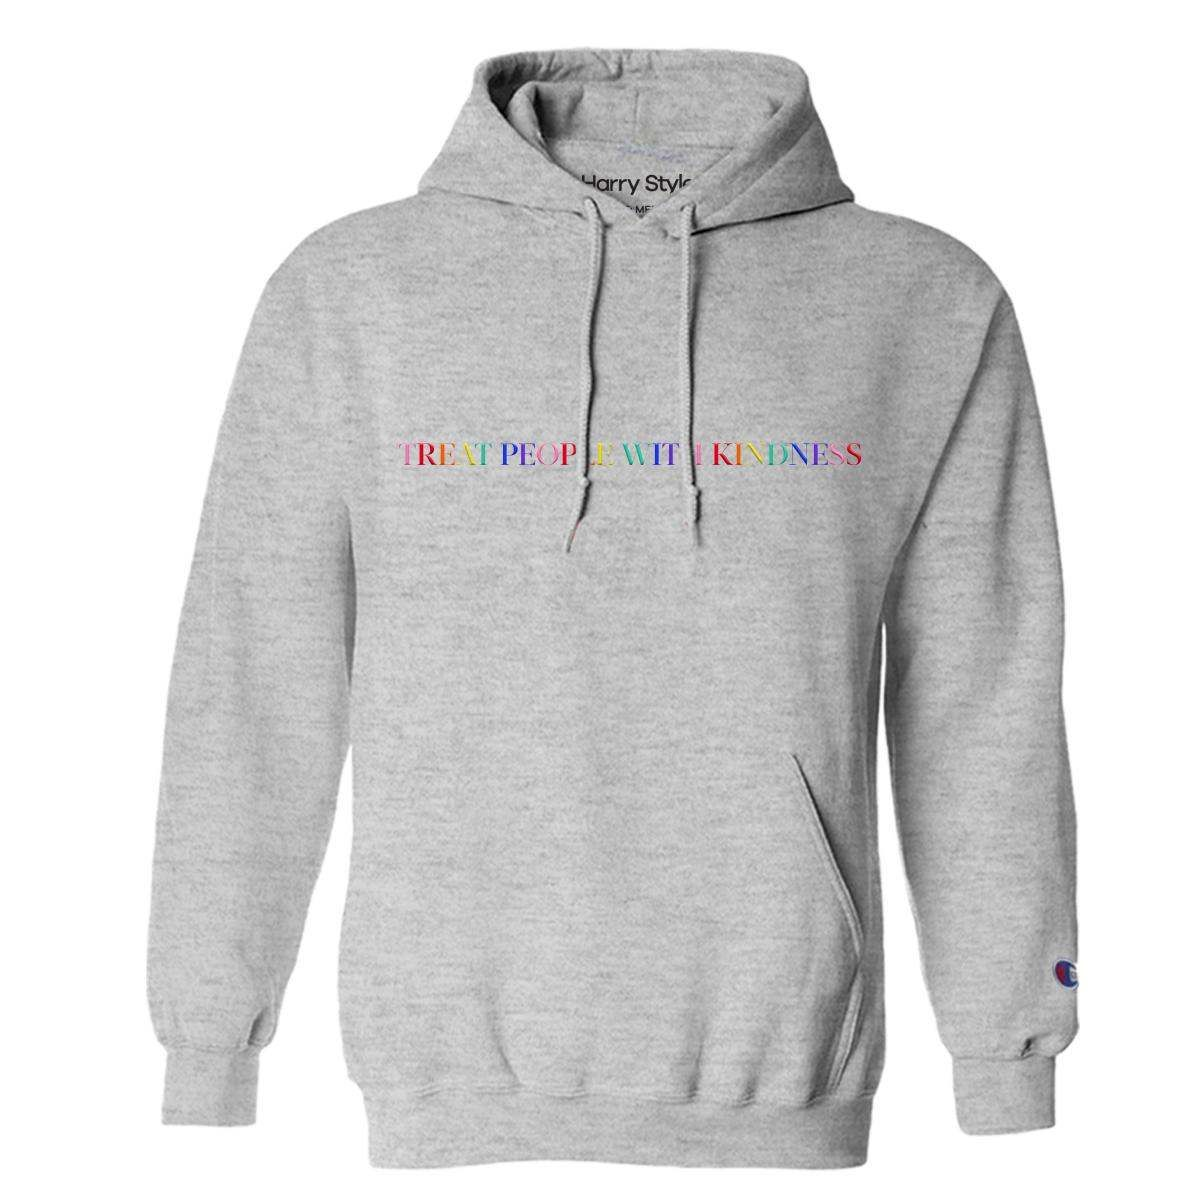 Harry Styles TREAT PEOPLE WITH KIND Hoodie Casual Sweatshirt Pullover Coat HOT